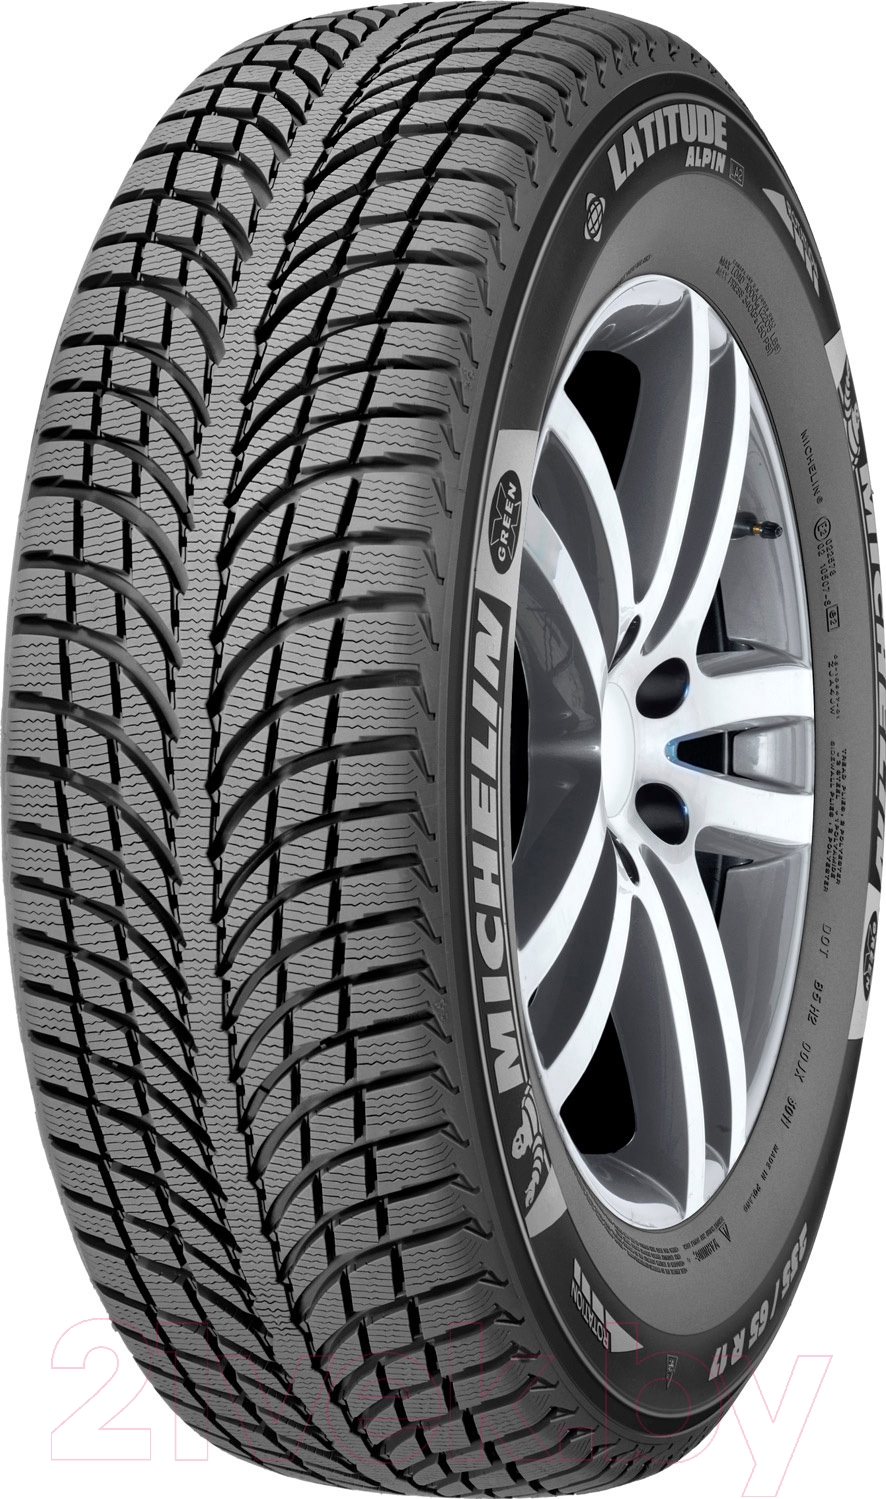 Купить Зимняя шина Michelin, Latitude Alpin LA2 255/65R17 114H, Франция